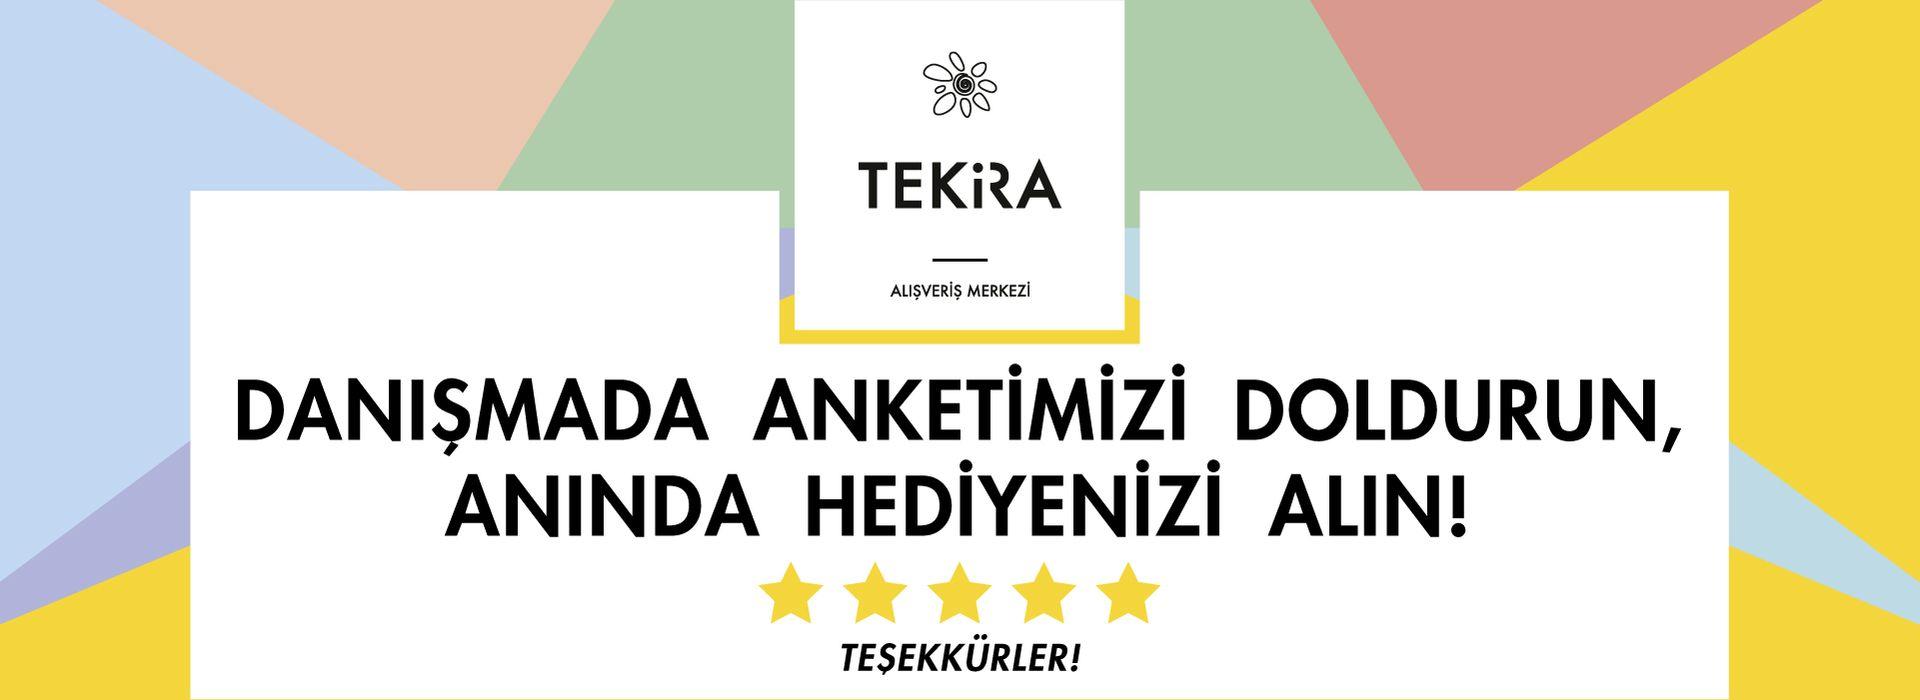 Tekira